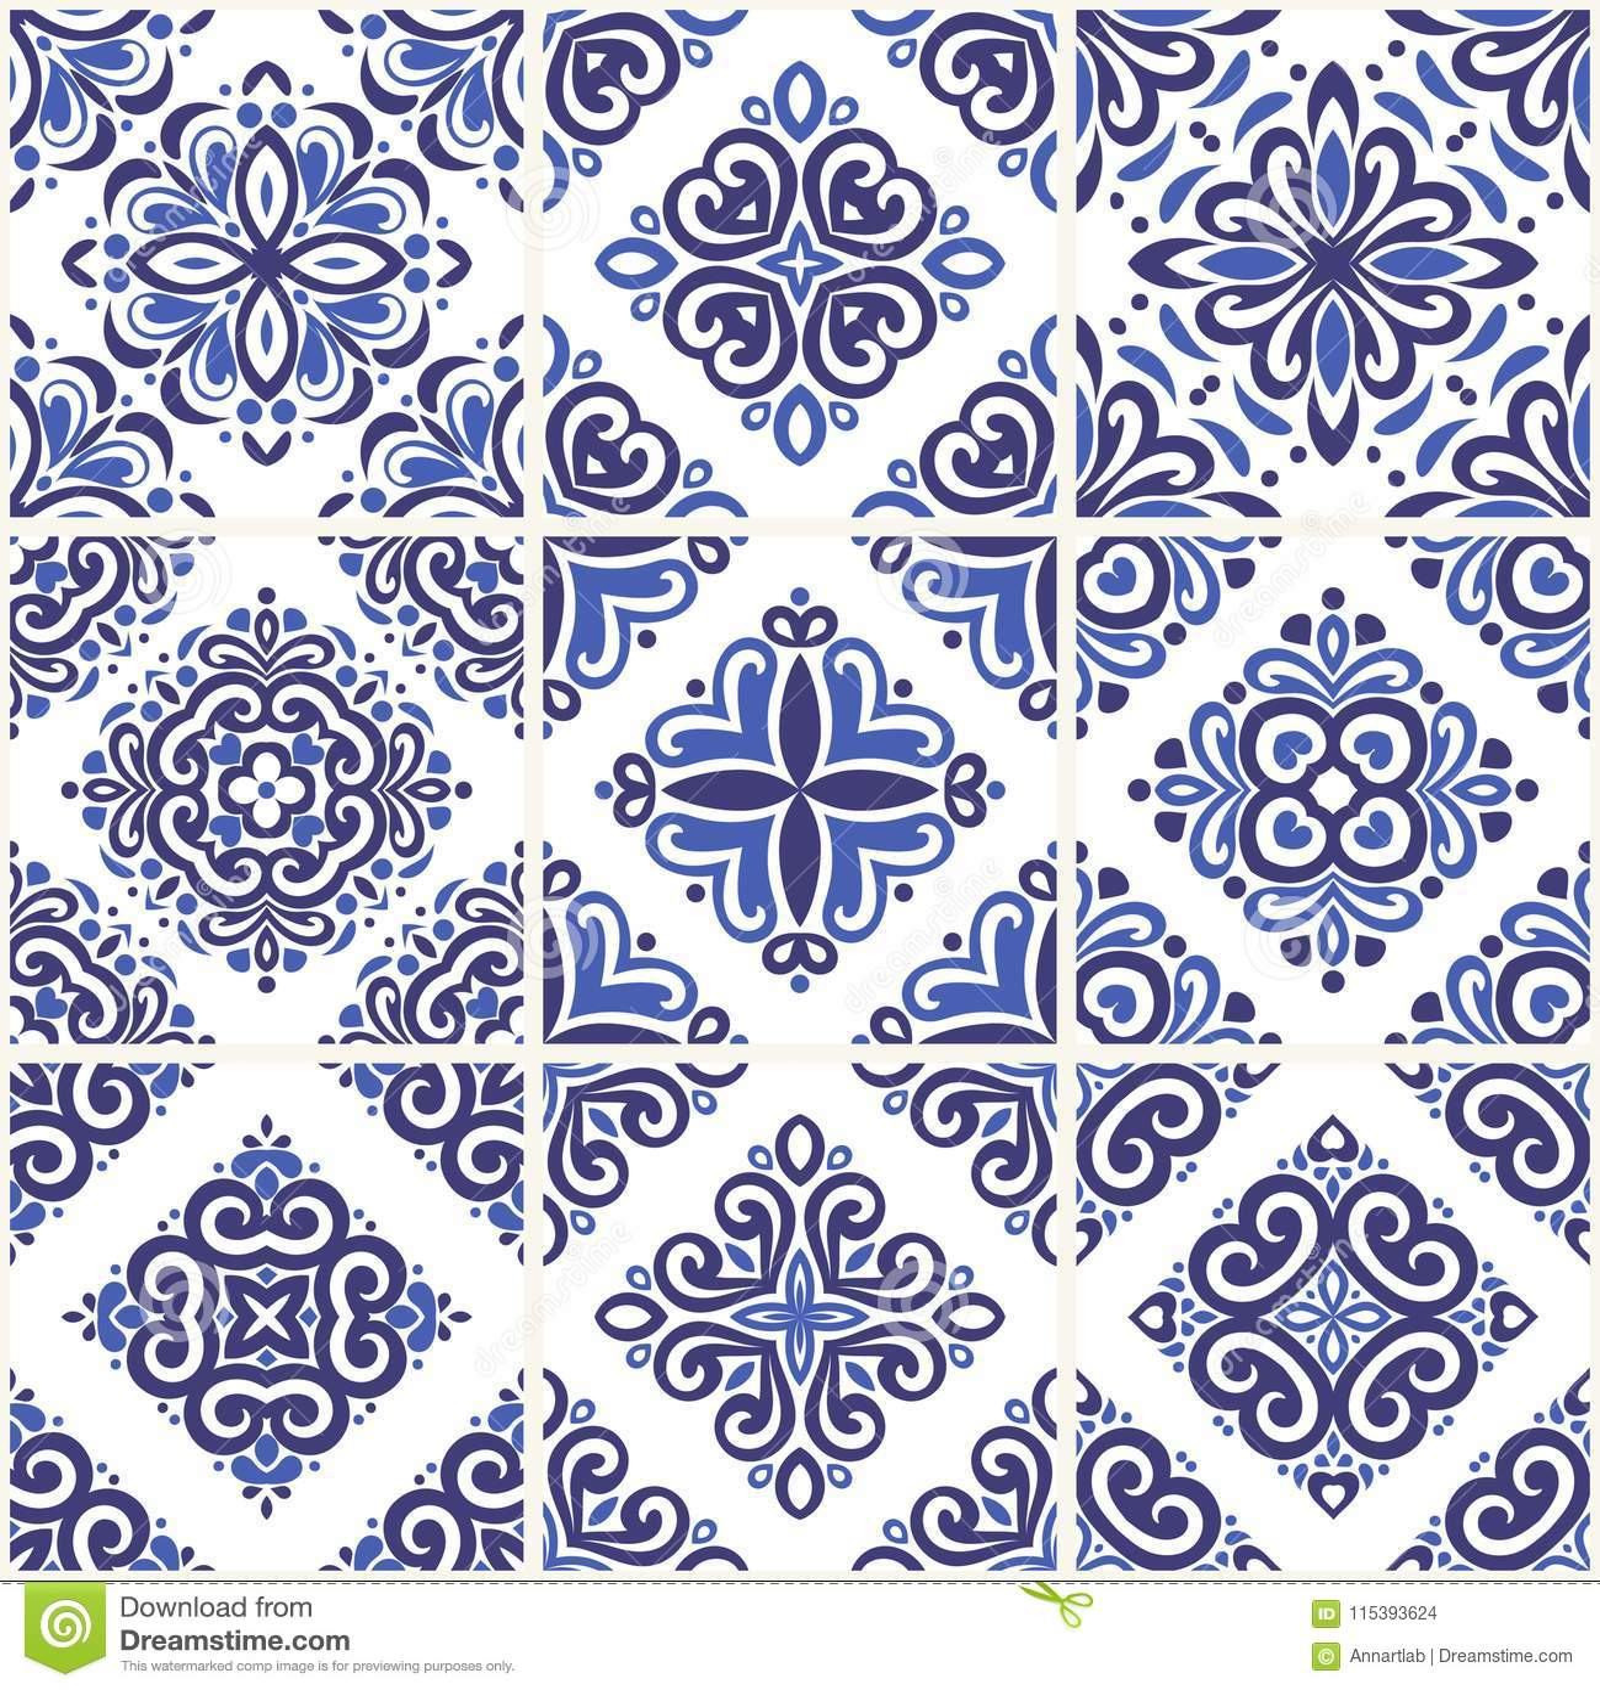 Blue and light blue ornamental azulejos tiles. Vintage decorative ornament illustration.